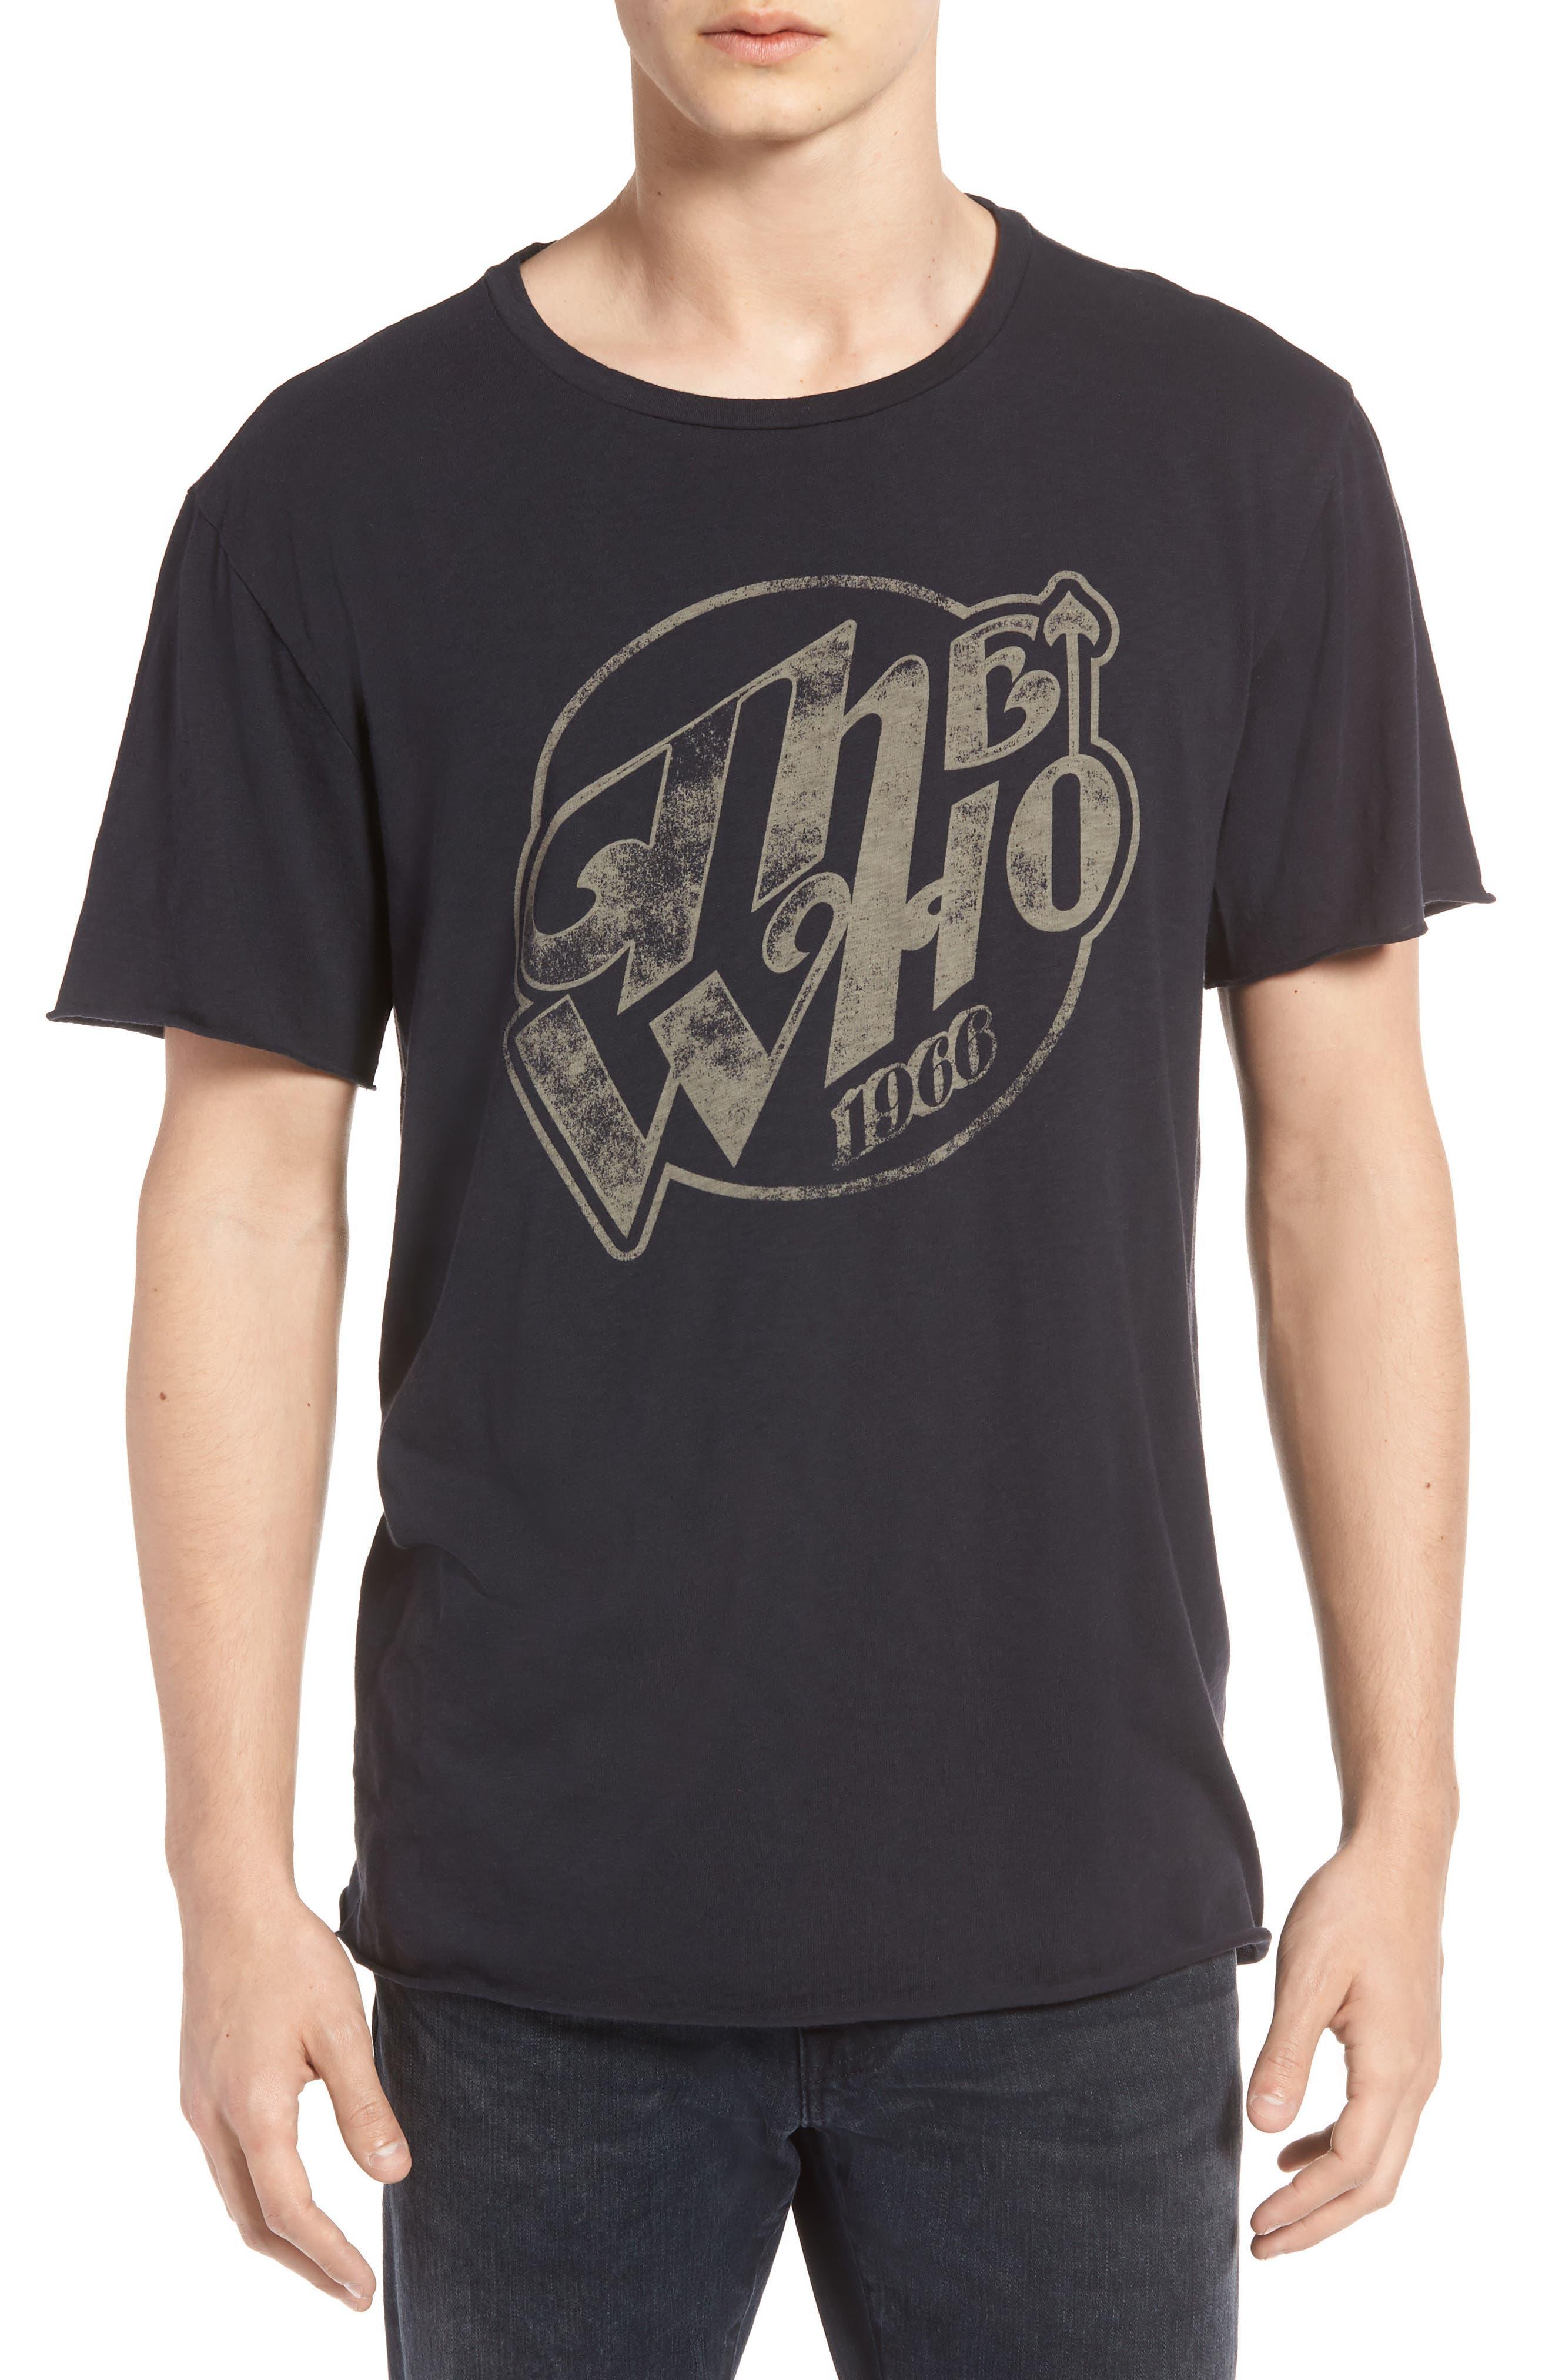 Treasure & Bond The Who Trim Fit T-Shirt